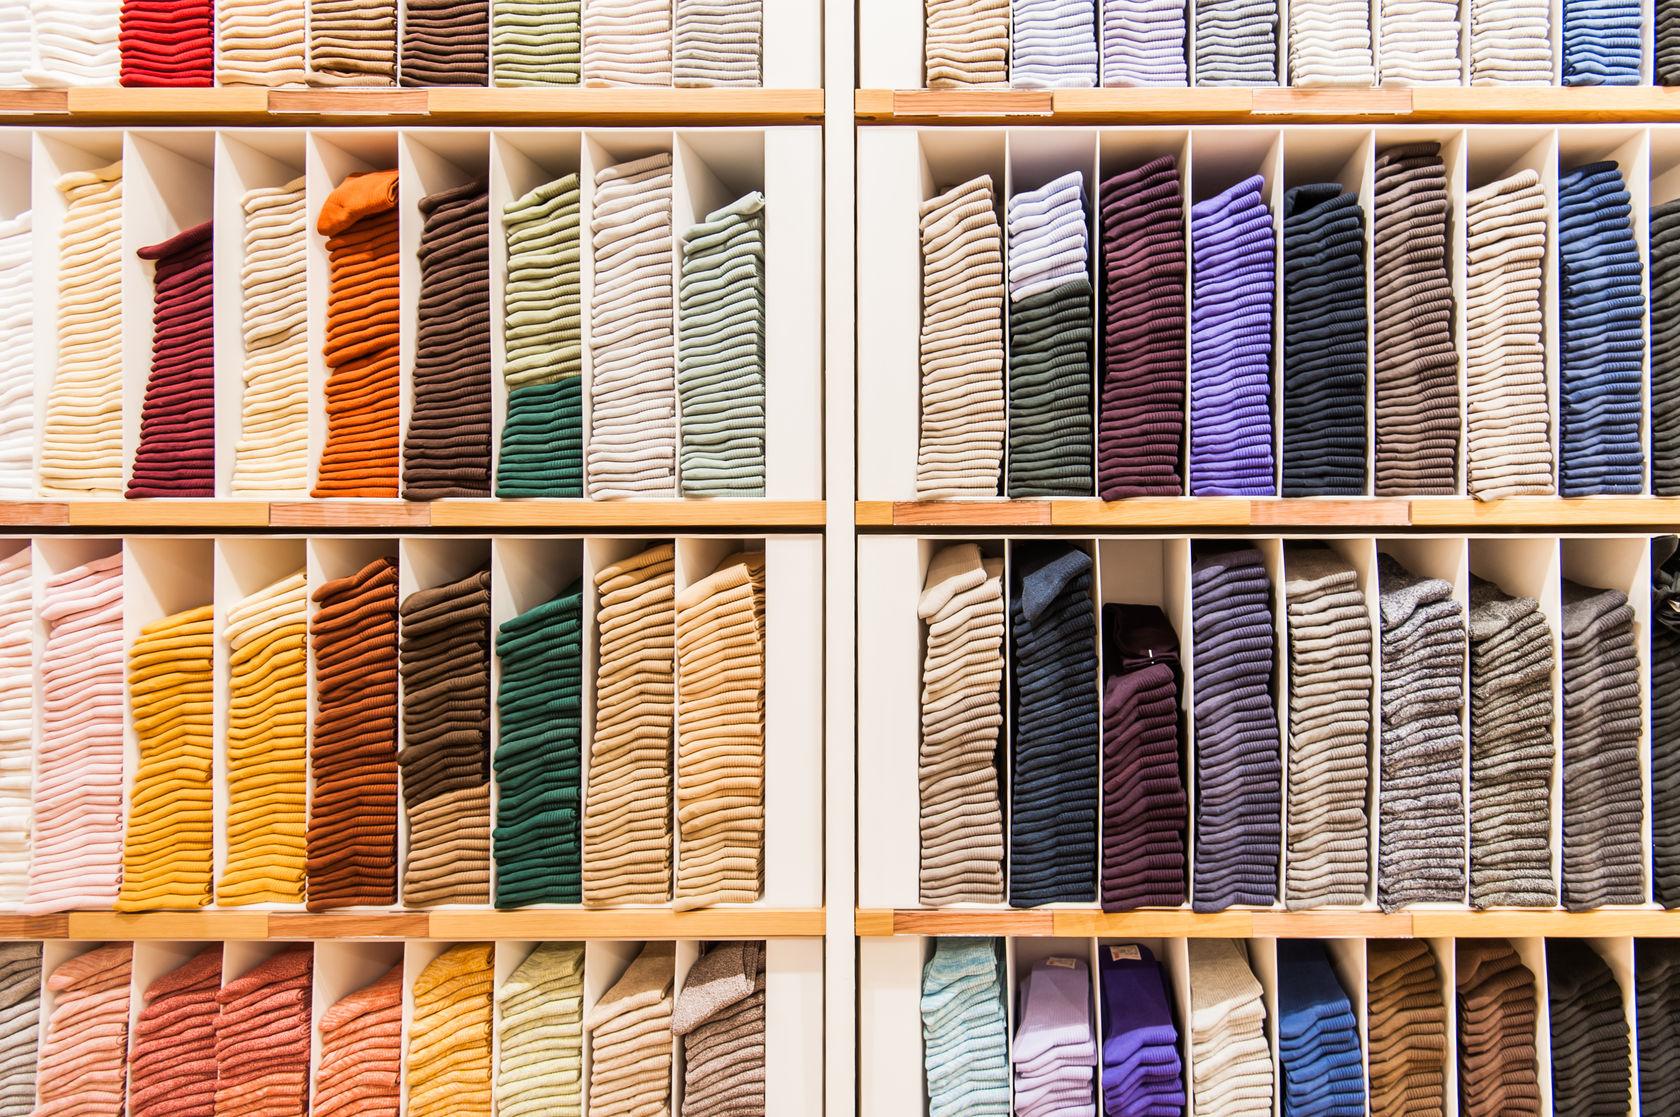 Huge selection of socks qualities